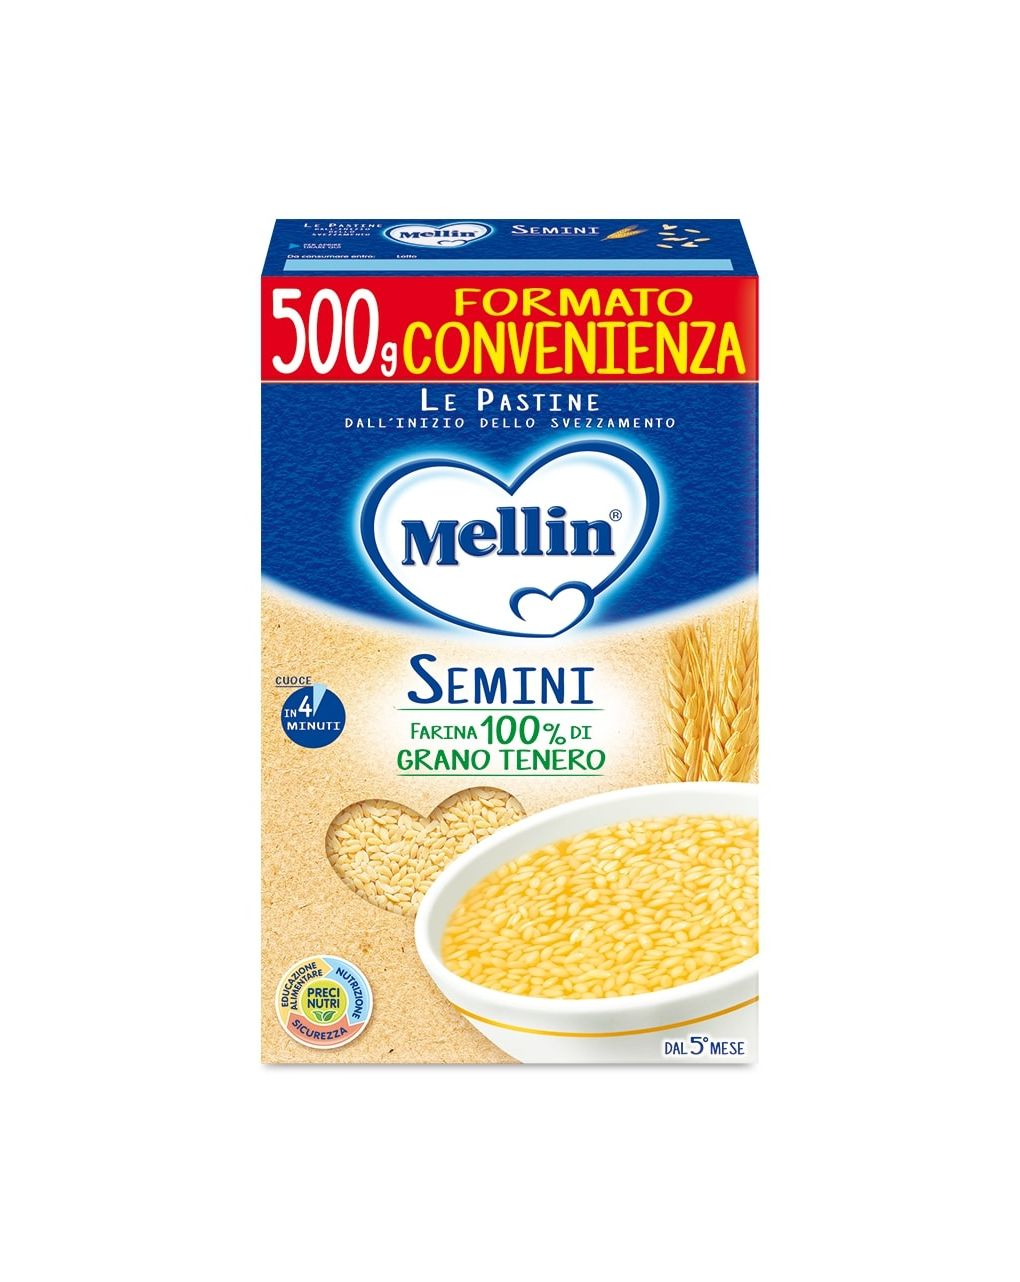 Mellin - pastina semini 500g - Mellin